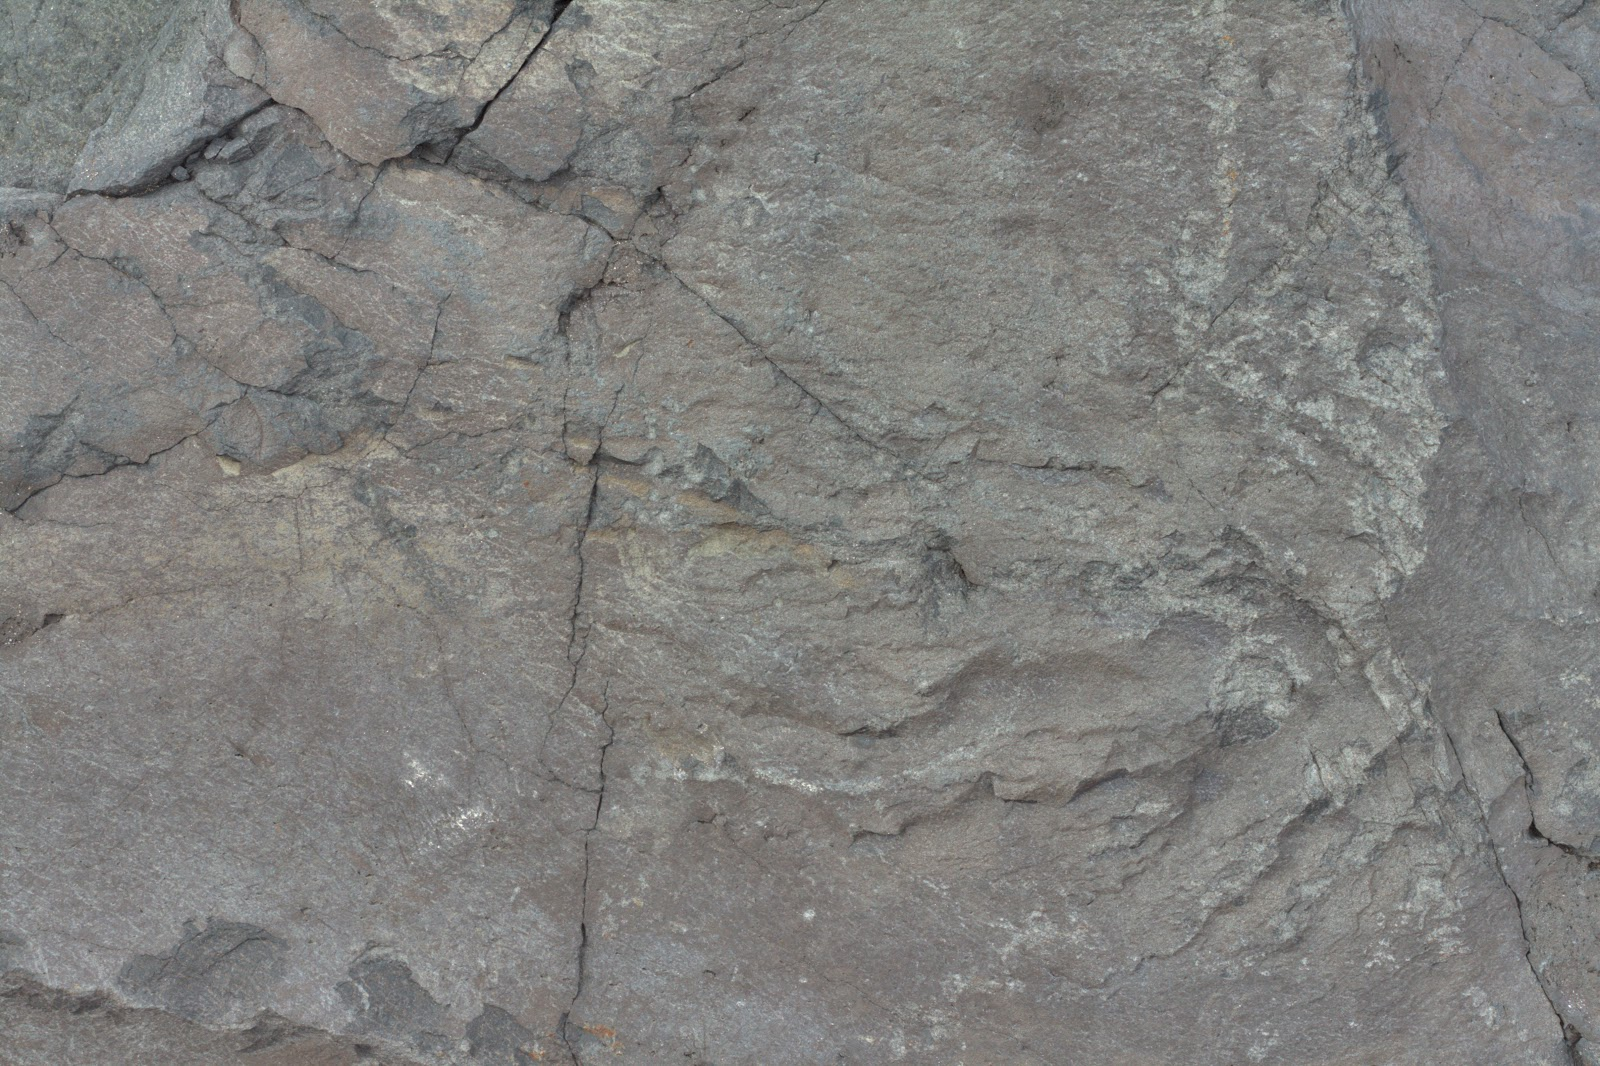 Rock face surface texture 4770x3178